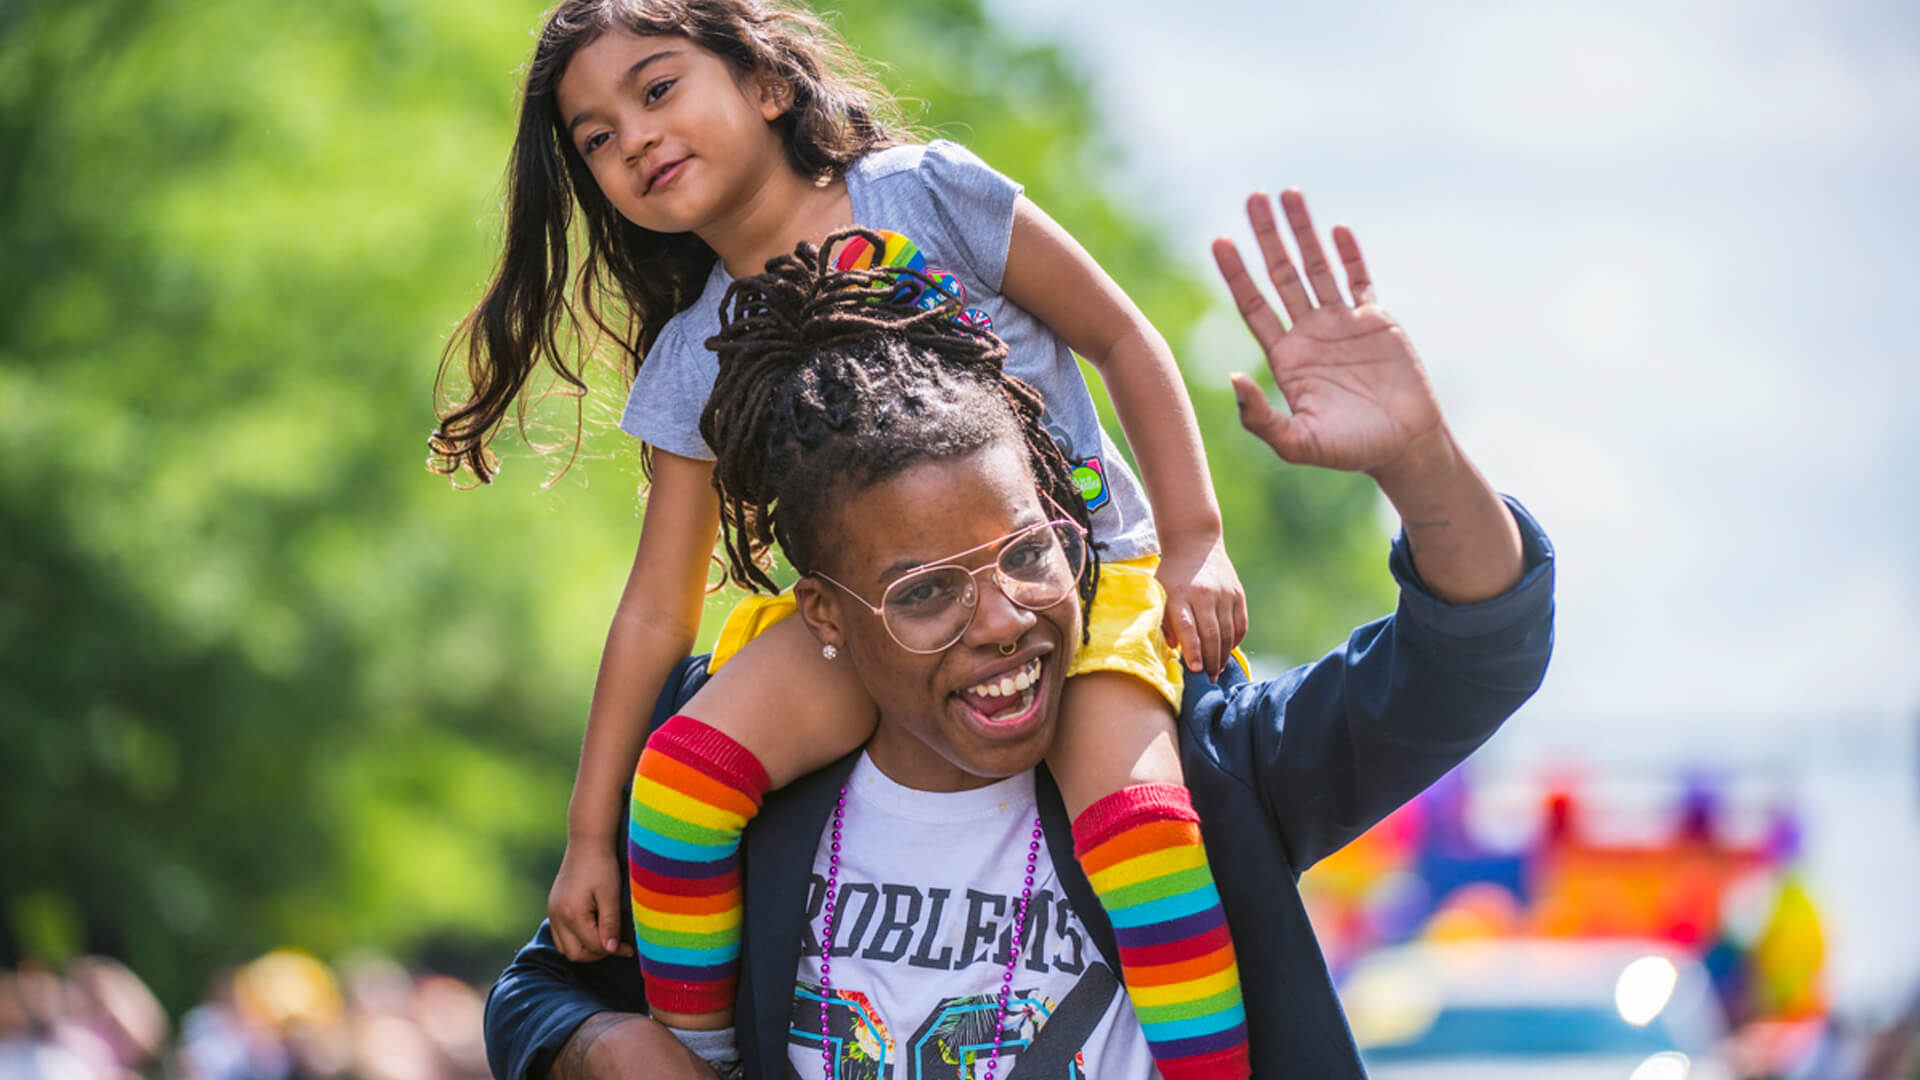 CoorsLight PrideFest Parade in Denver